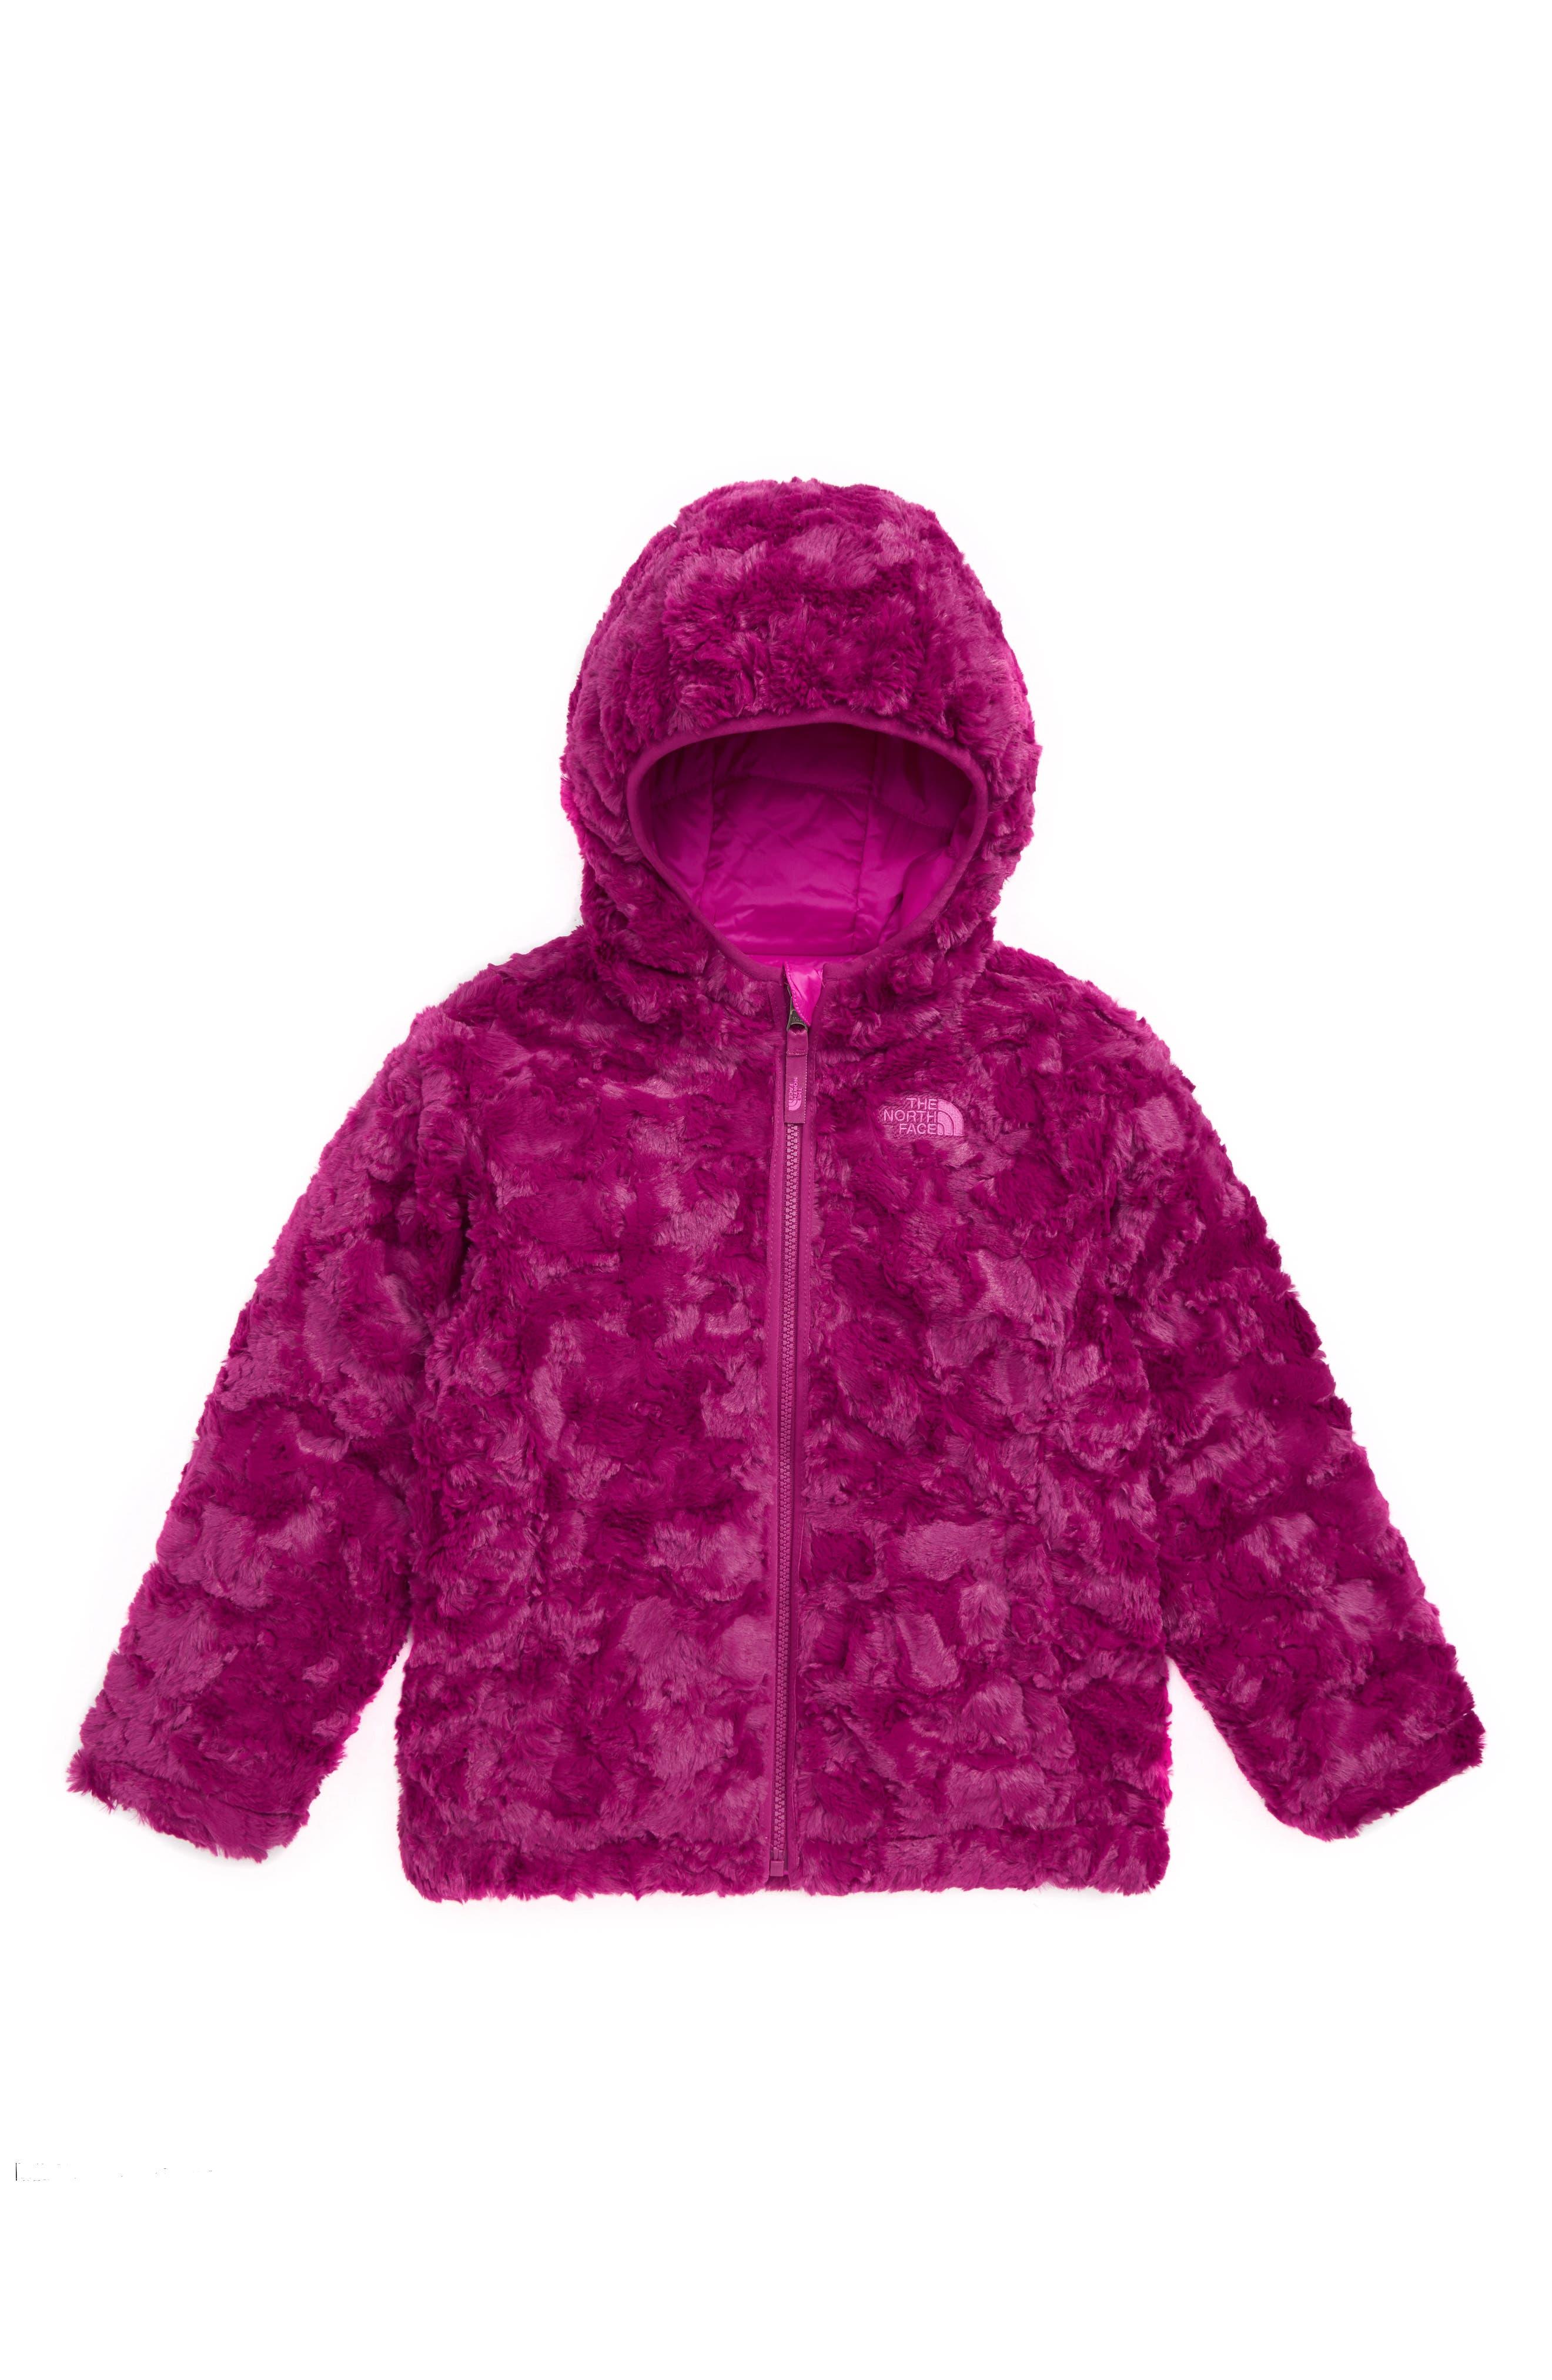 Mossbud Swirl Insulated Reversible Jacket,                             Alternate thumbnail 2, color,                             AZALEA PINK/ DRAMATIC PLUM